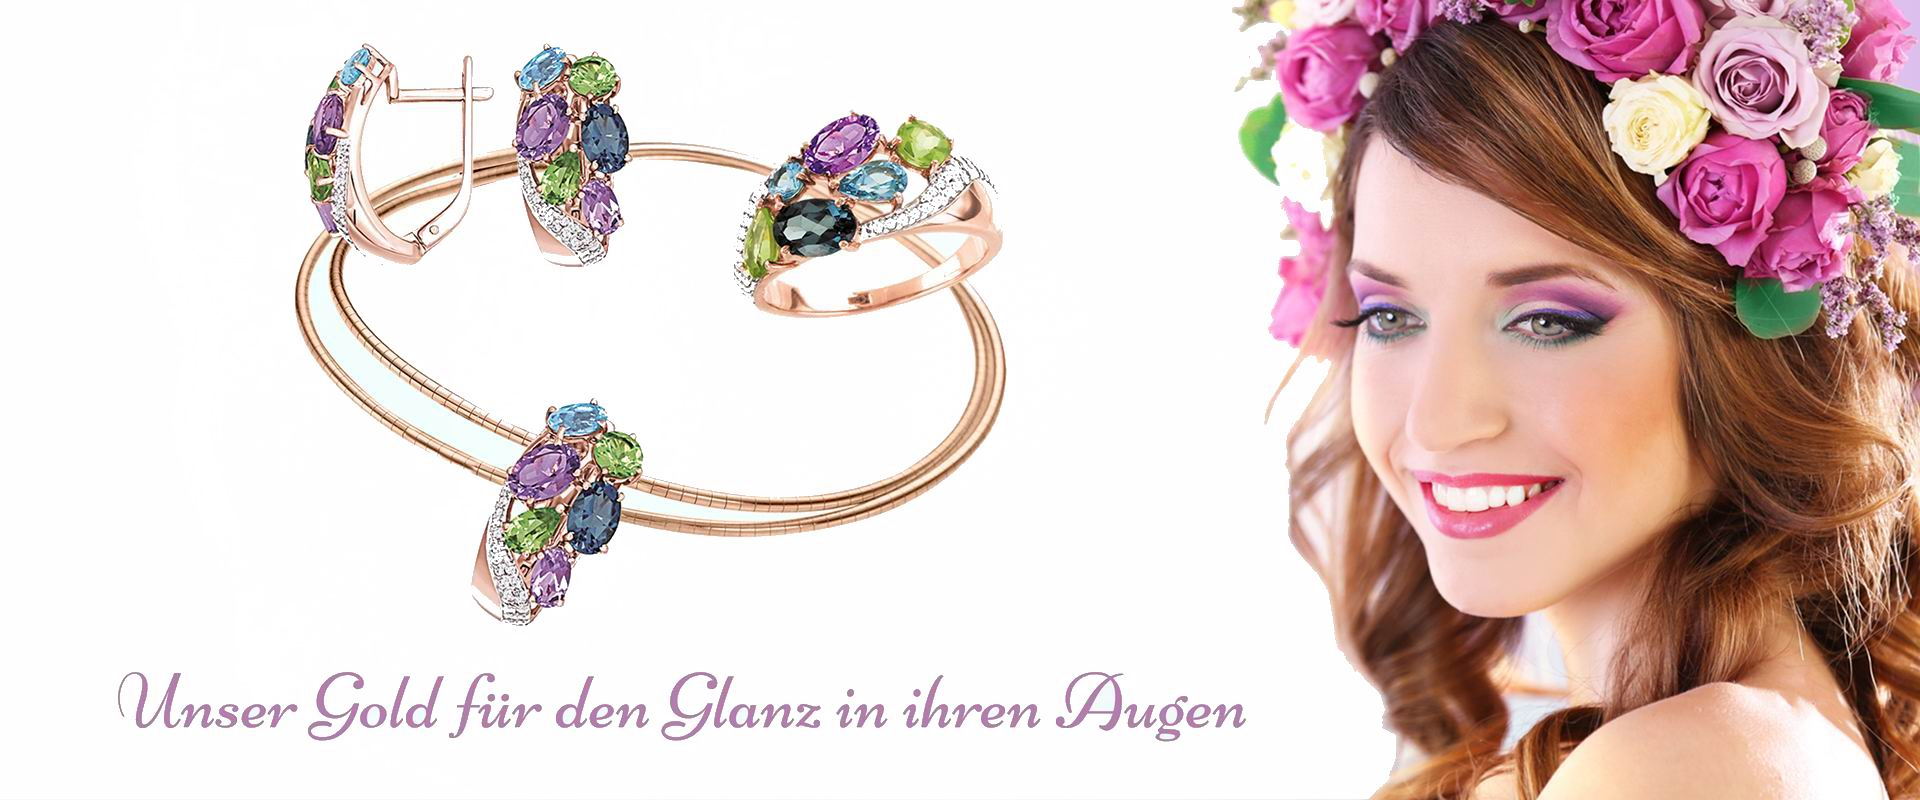 Russian gold 585 jewelry Russian silver 925 jewelry Russkoe Zoloto